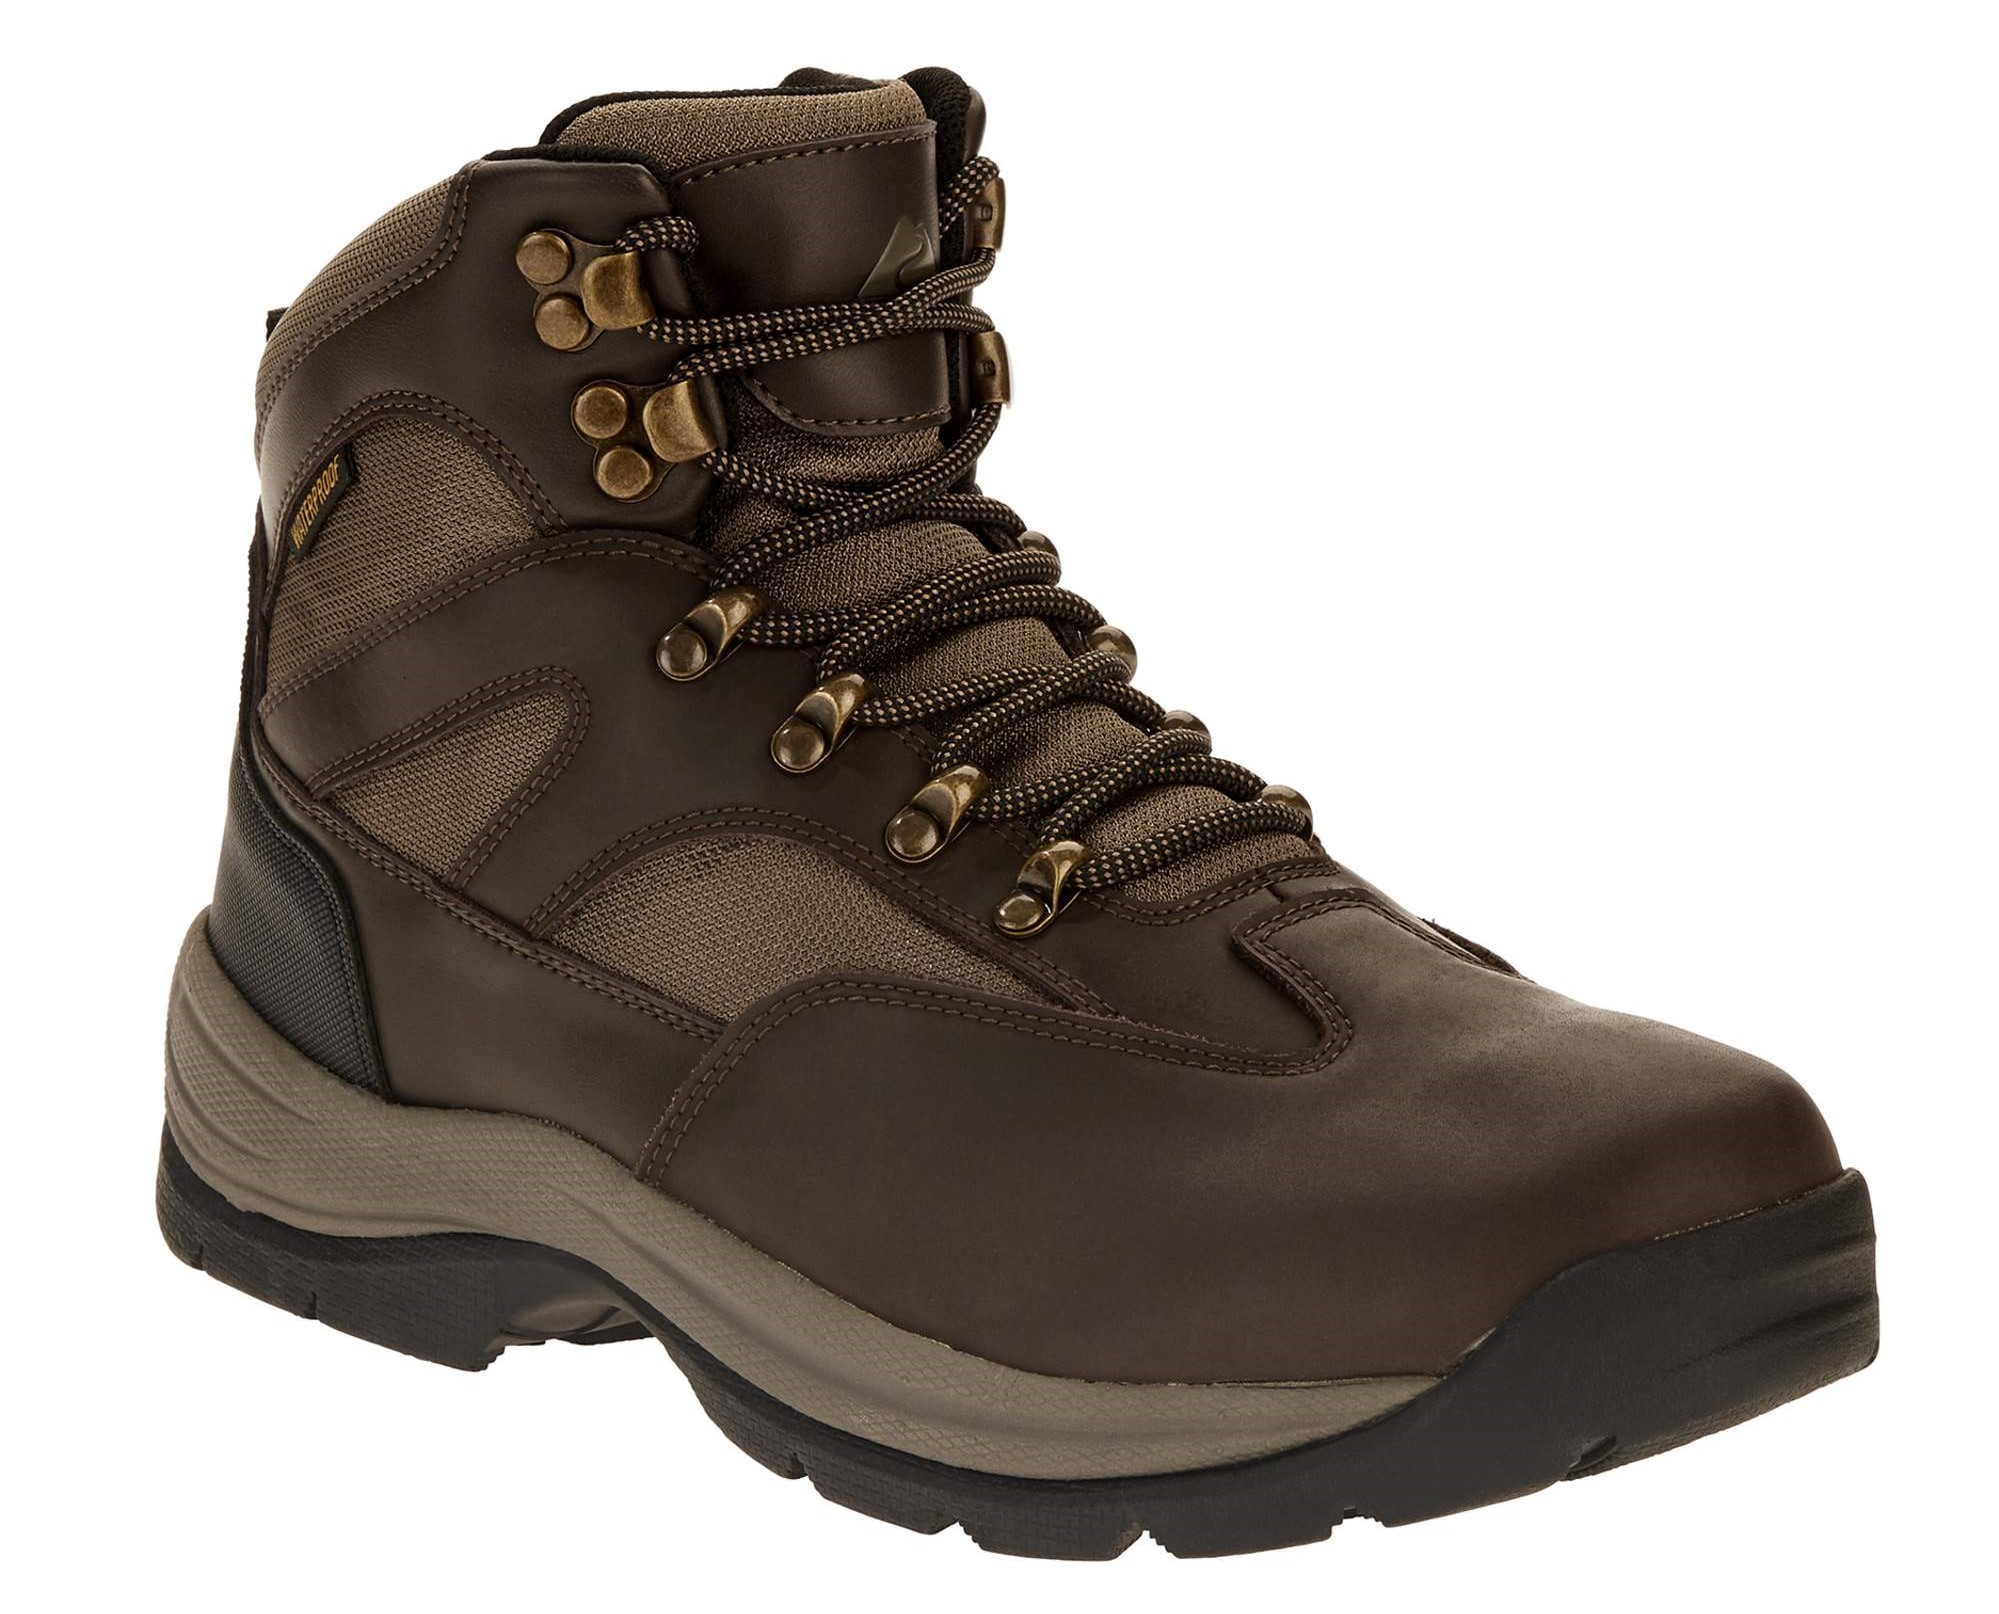 Boots earrings Hiking boot earrings bronze with hemp shoelaces.